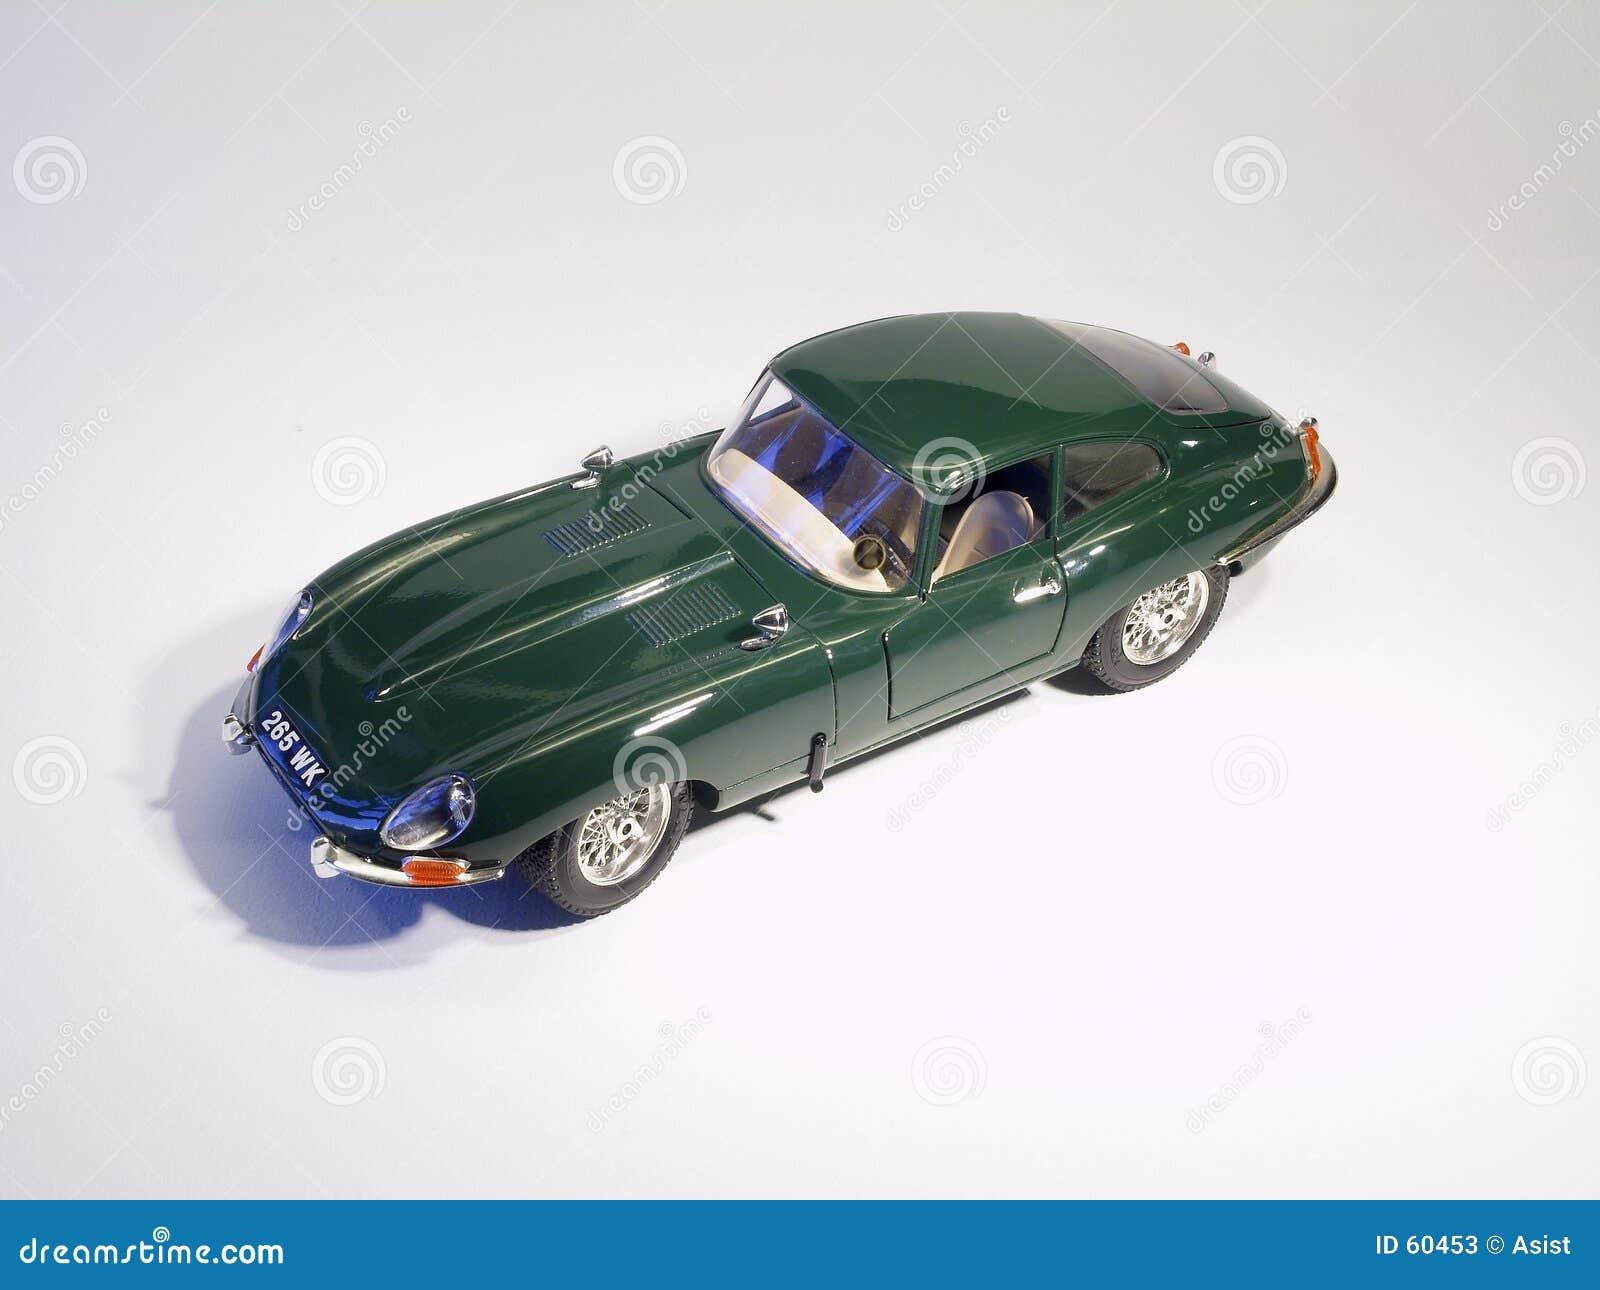 E jaguar model sportscar type